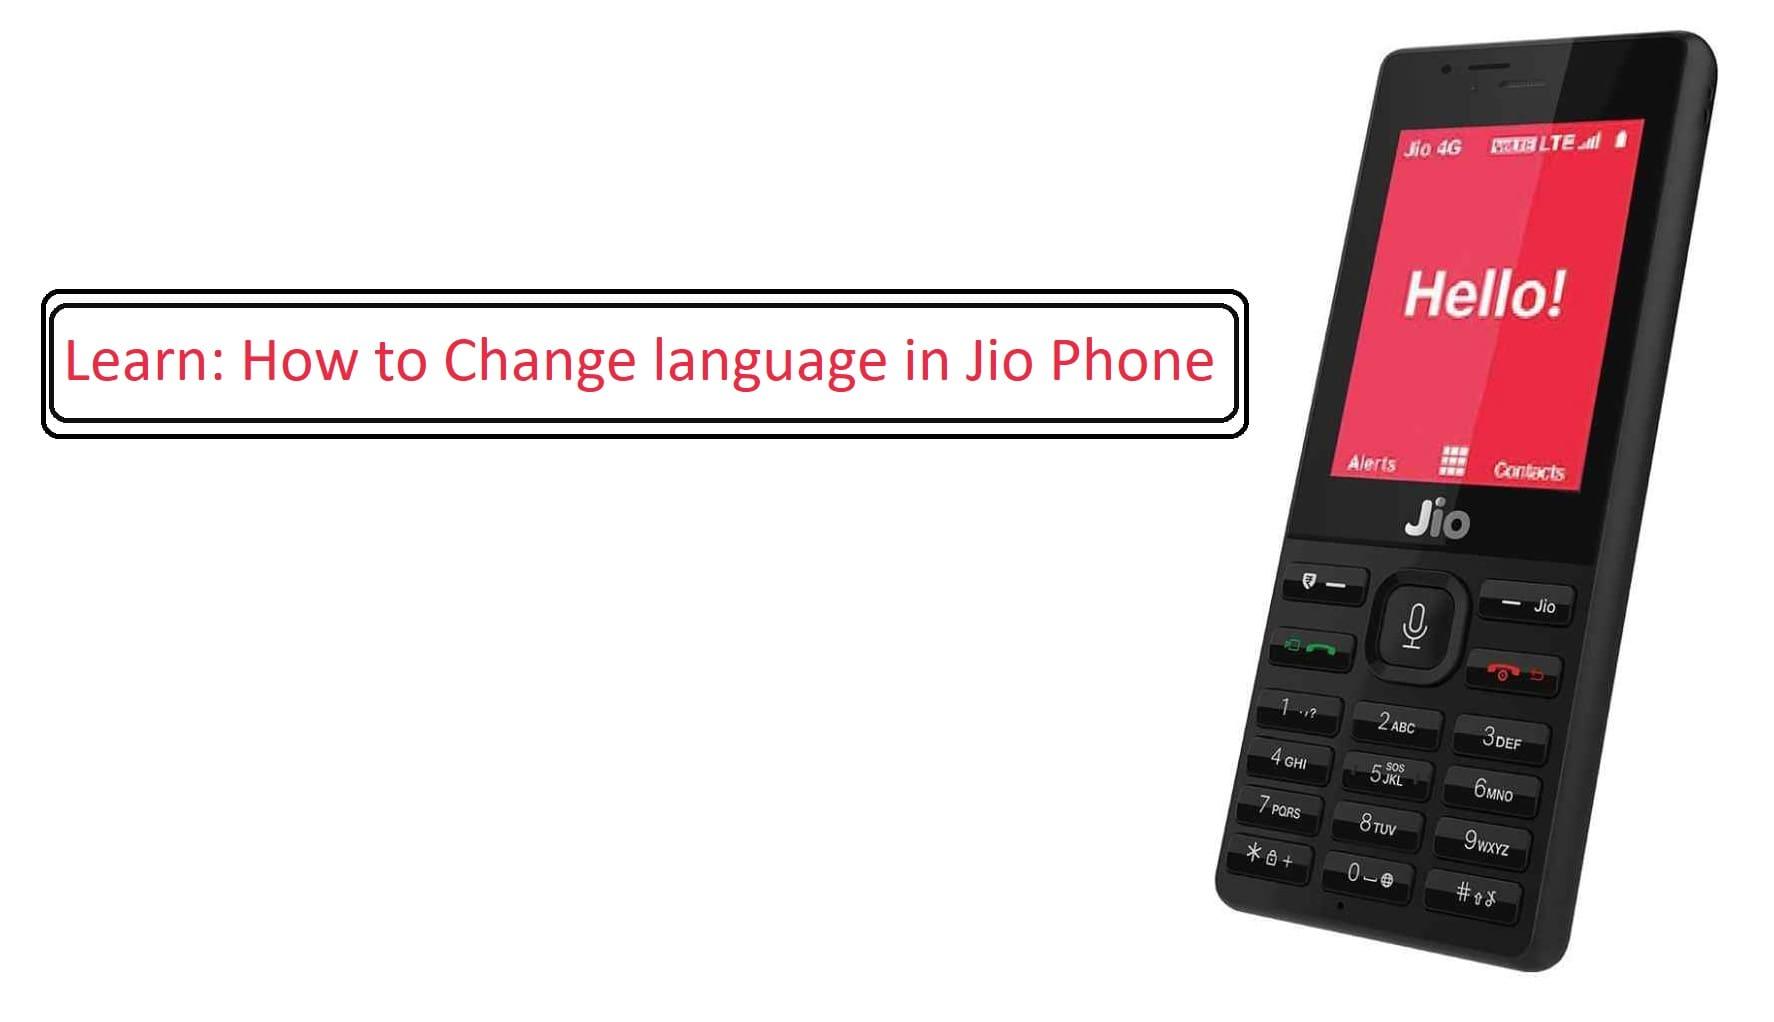 How to change language in jio phone